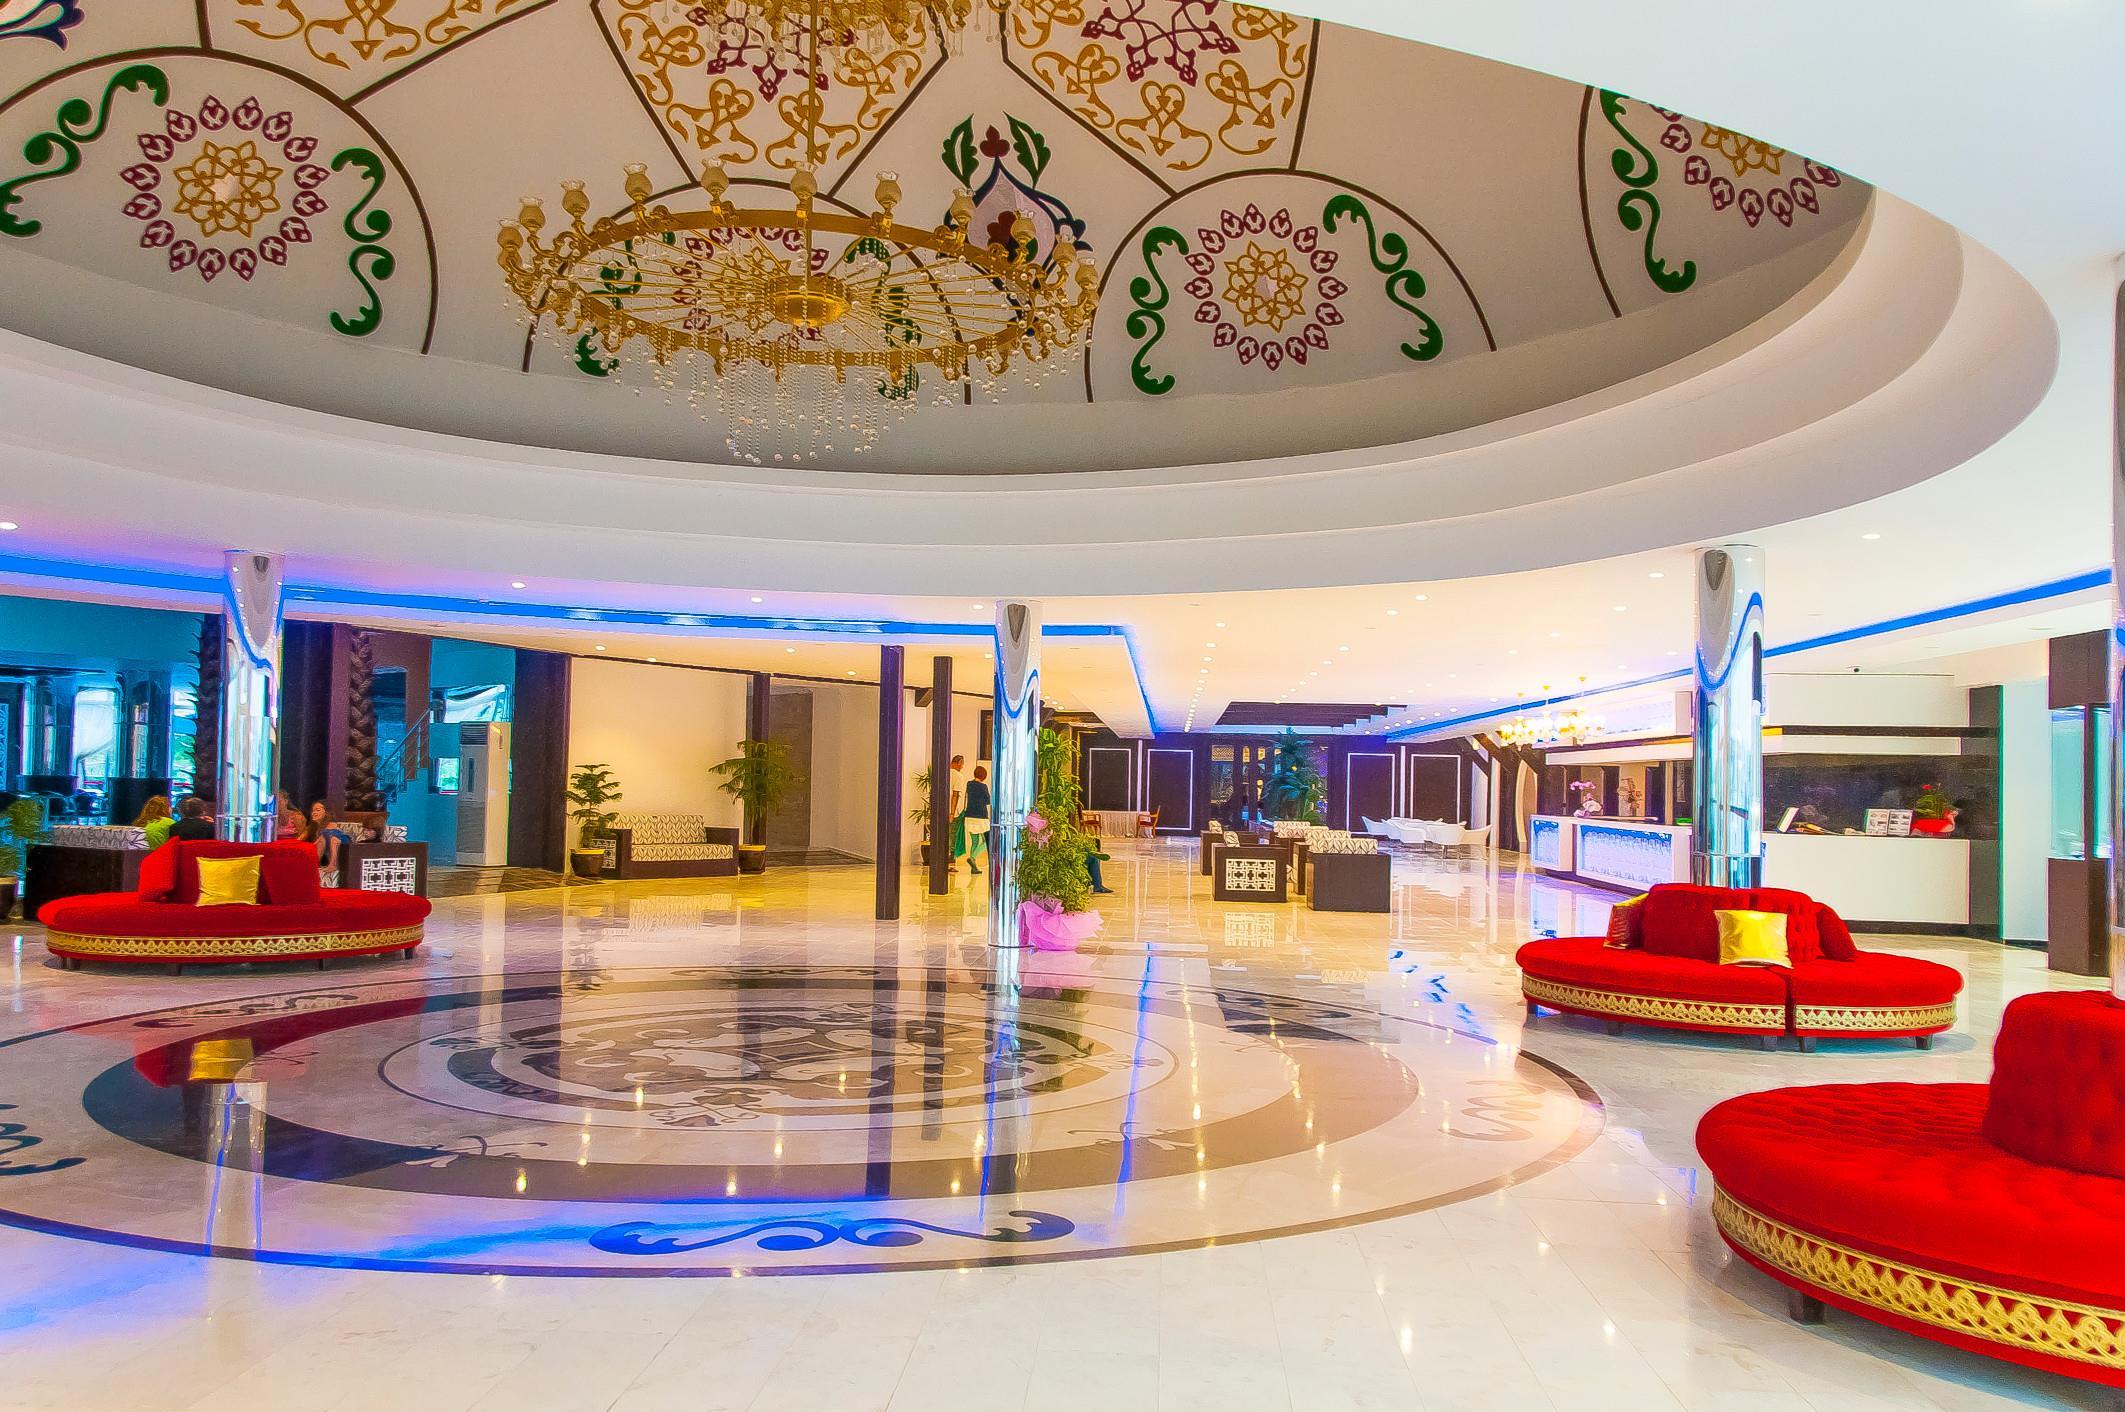 http://www.orextravel.sk/OREX/hotelphotos/side-royal-paradise-general-0034.jpg